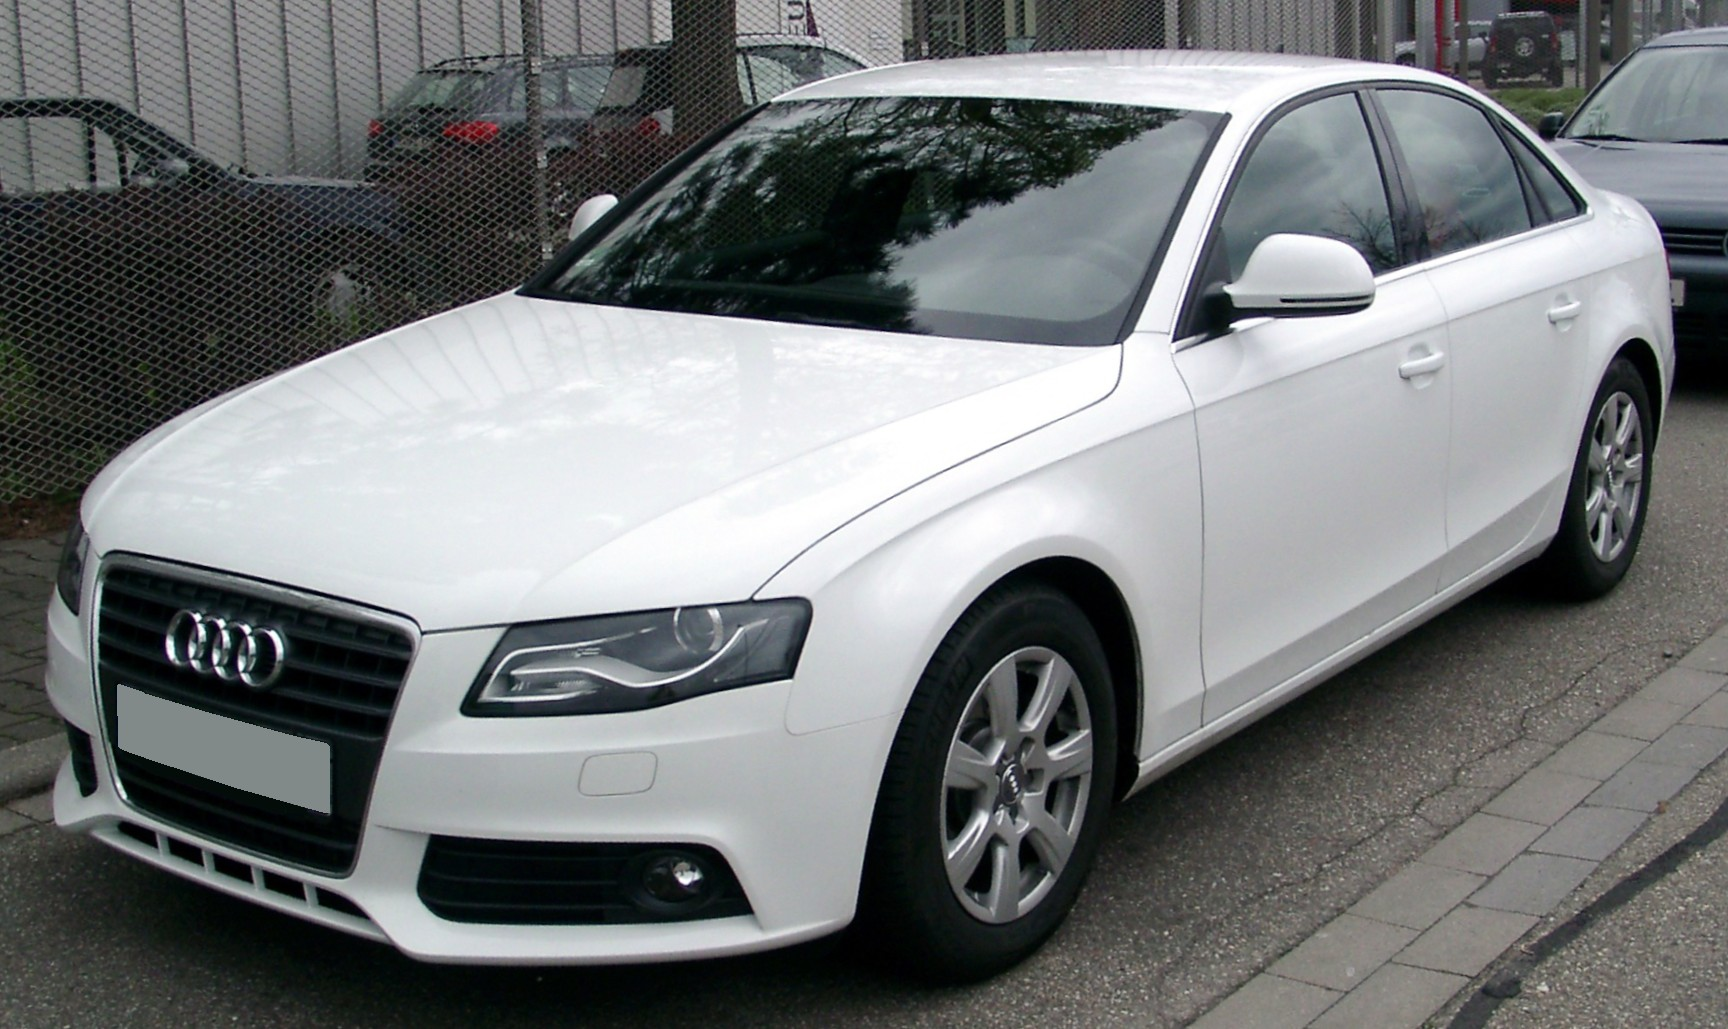 Audi_A4_B8_front_20080414.jpg